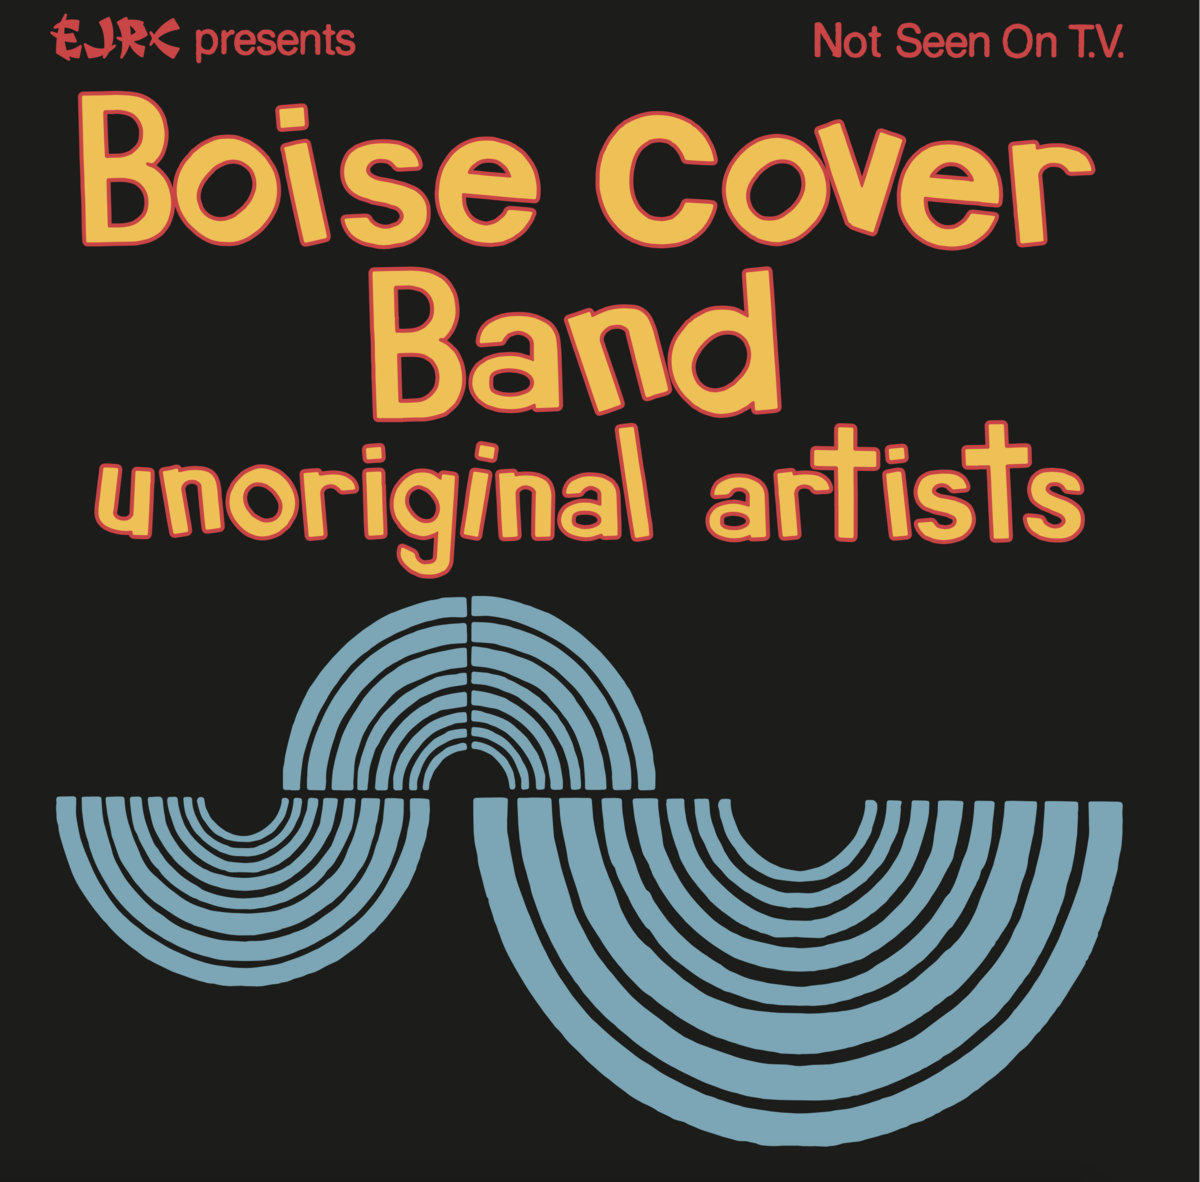 Boise Cover Band – Unoriginal Artists